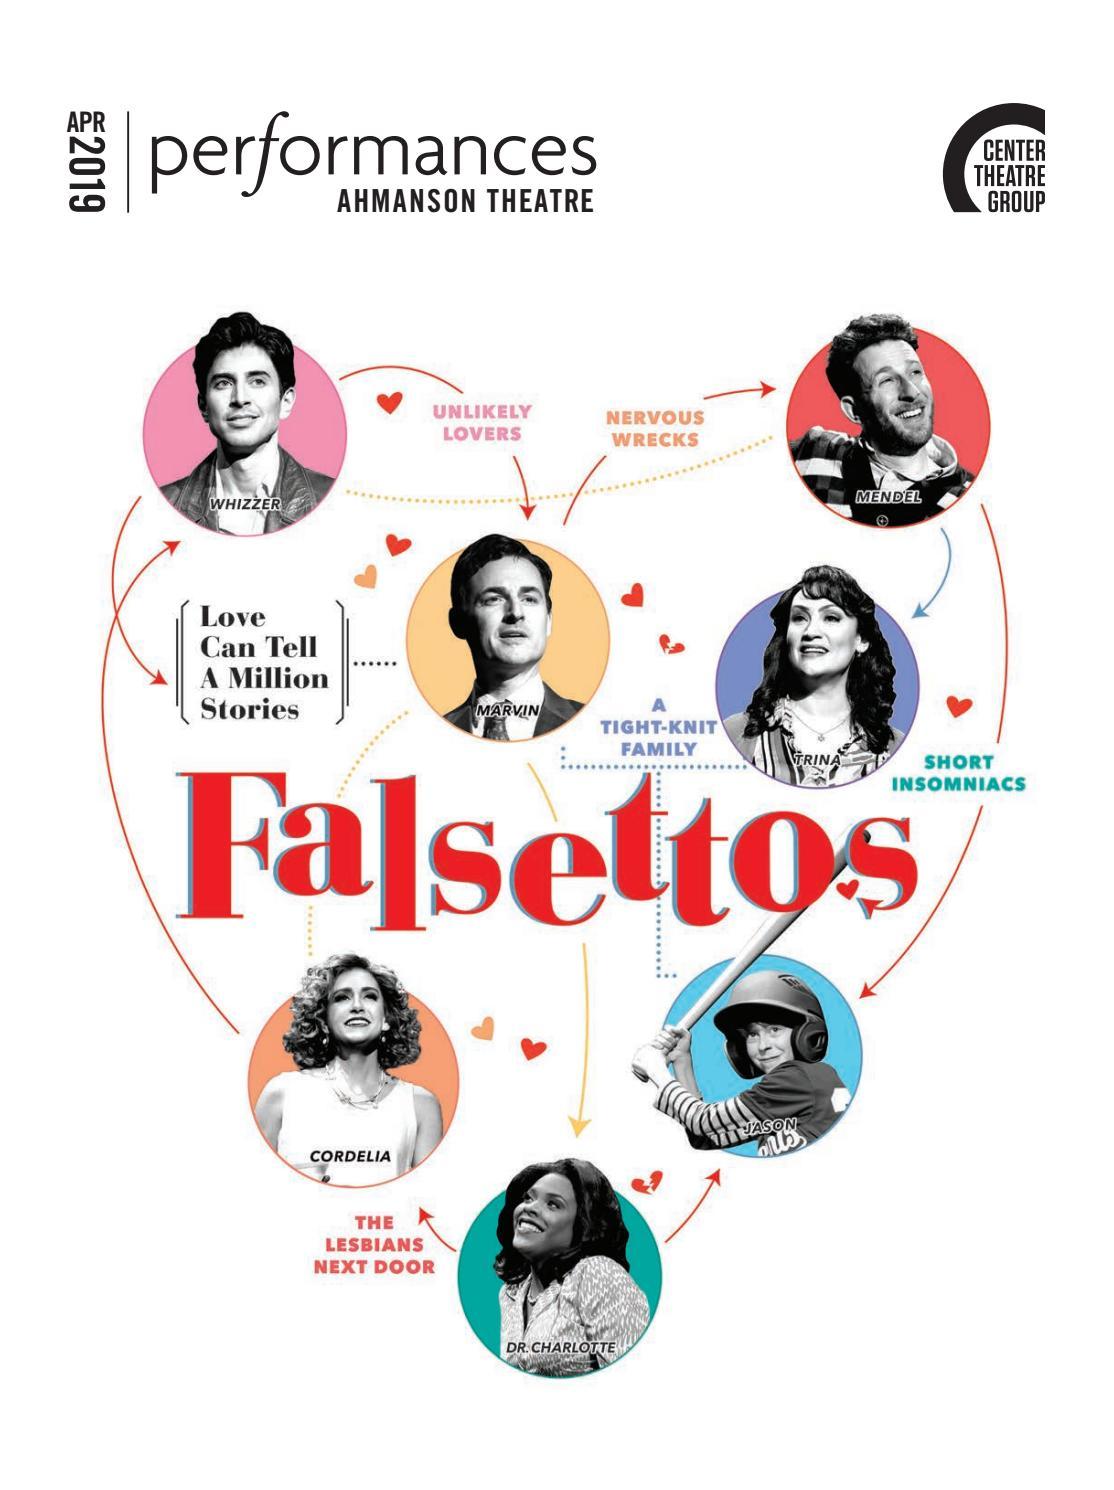 Falsettos at Center Theatre Group, April 2019 by Center